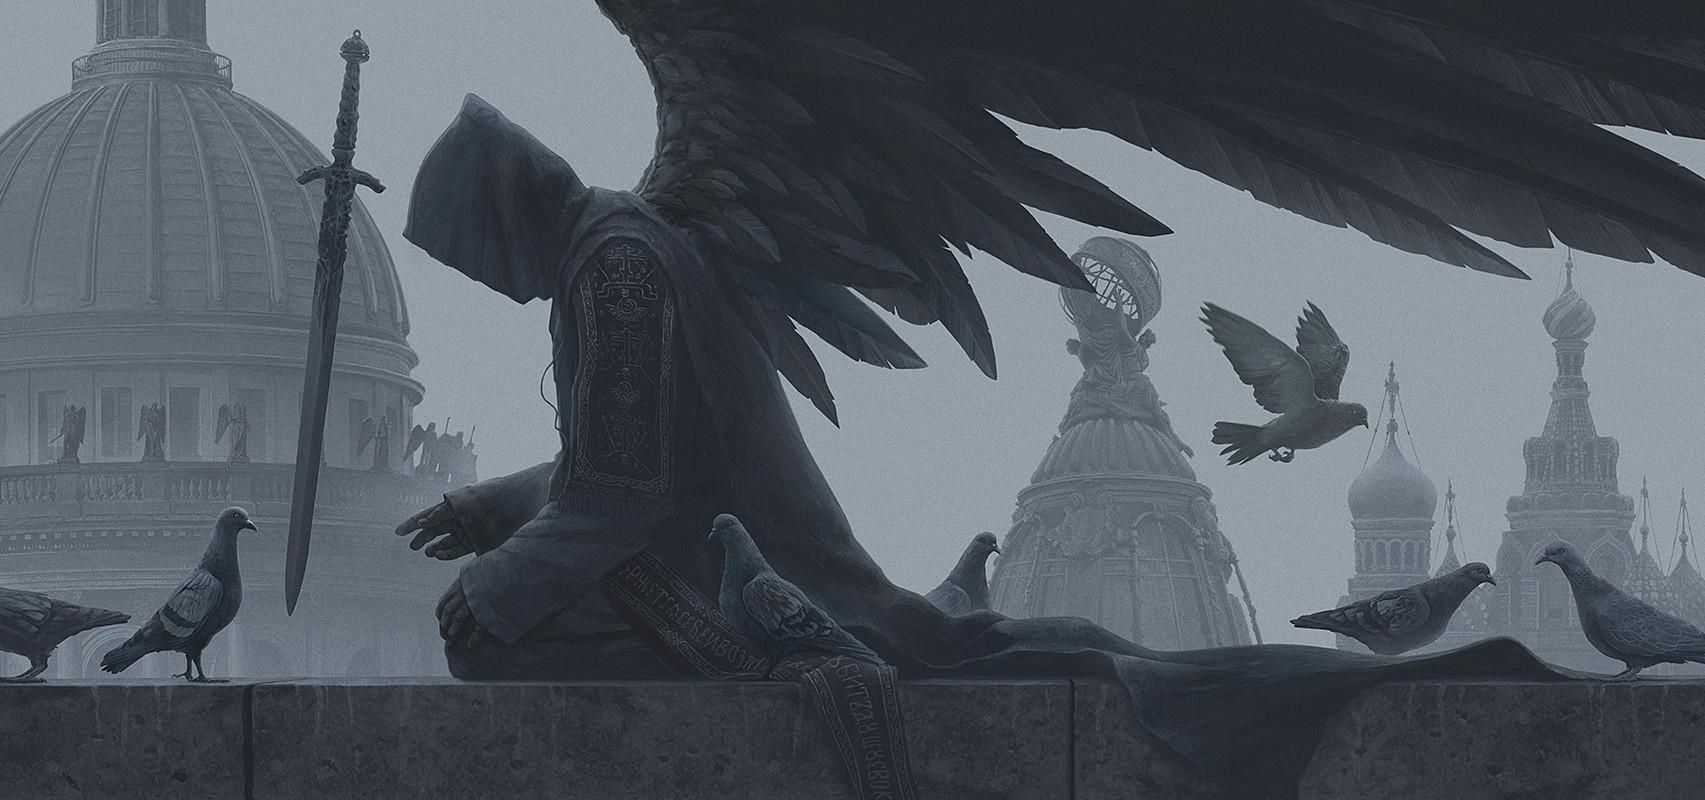 Alexey Egorov Digital Art Fantasy Art Sword Monochrome Dove Western Architecture 1705x800